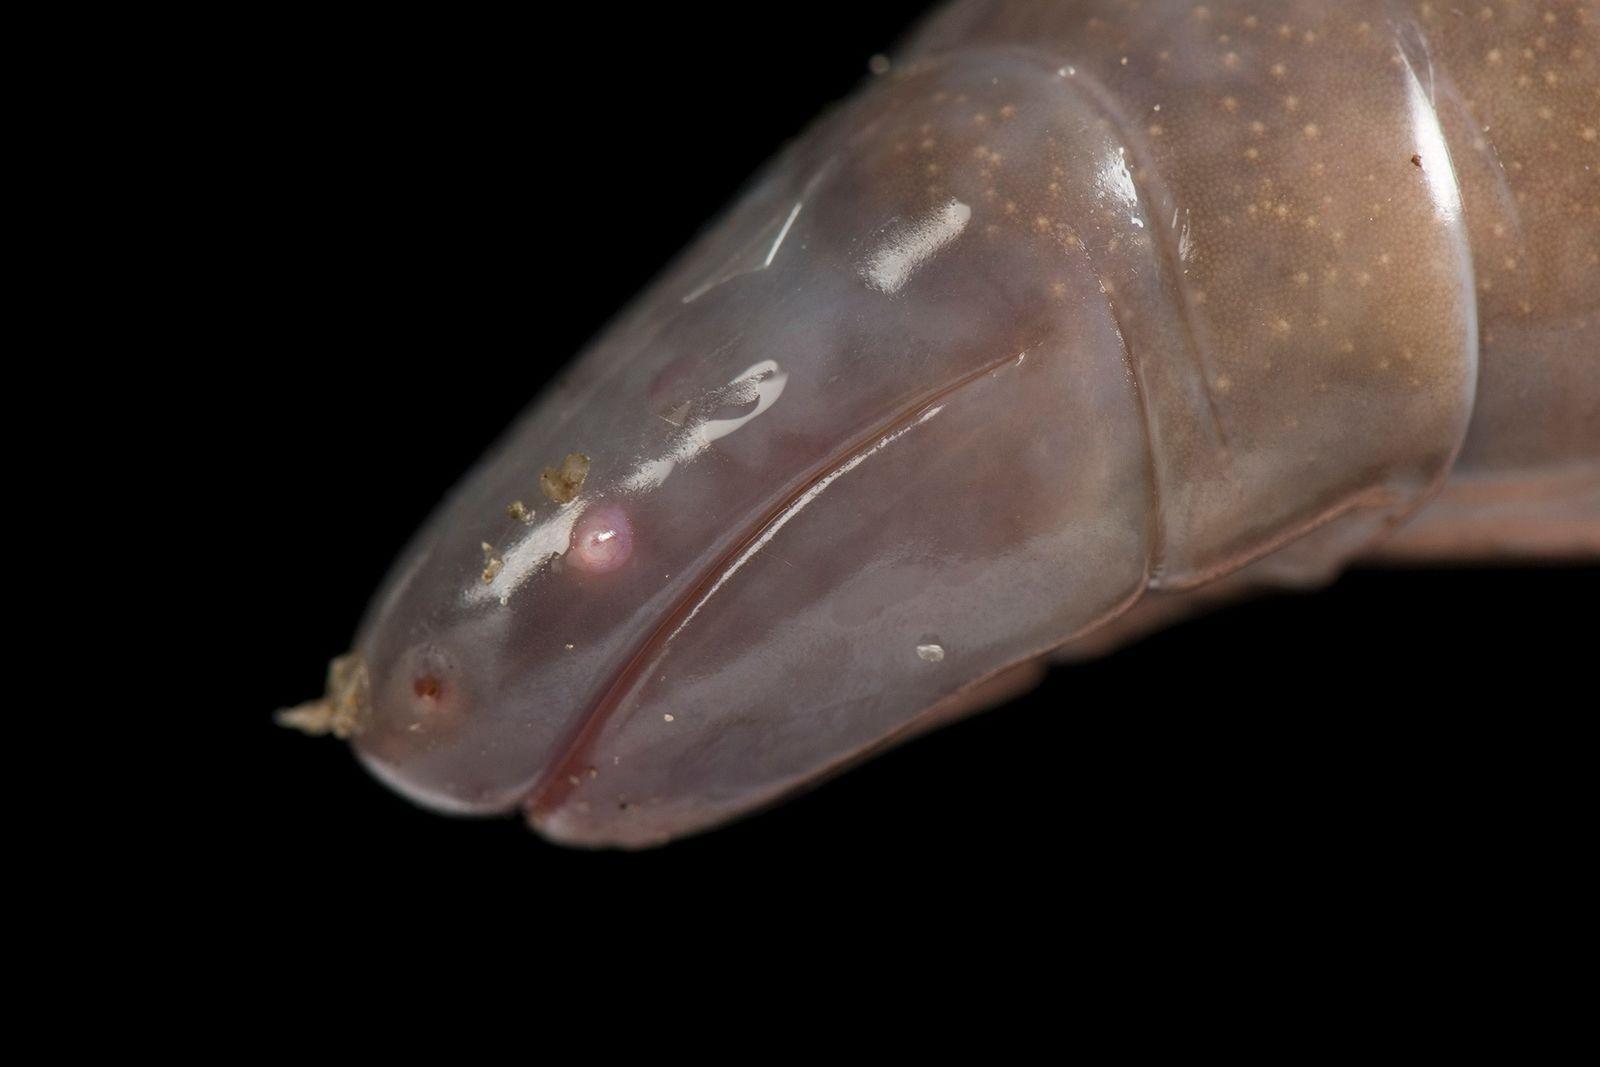 These worm-like amphibians may have venomous saliva